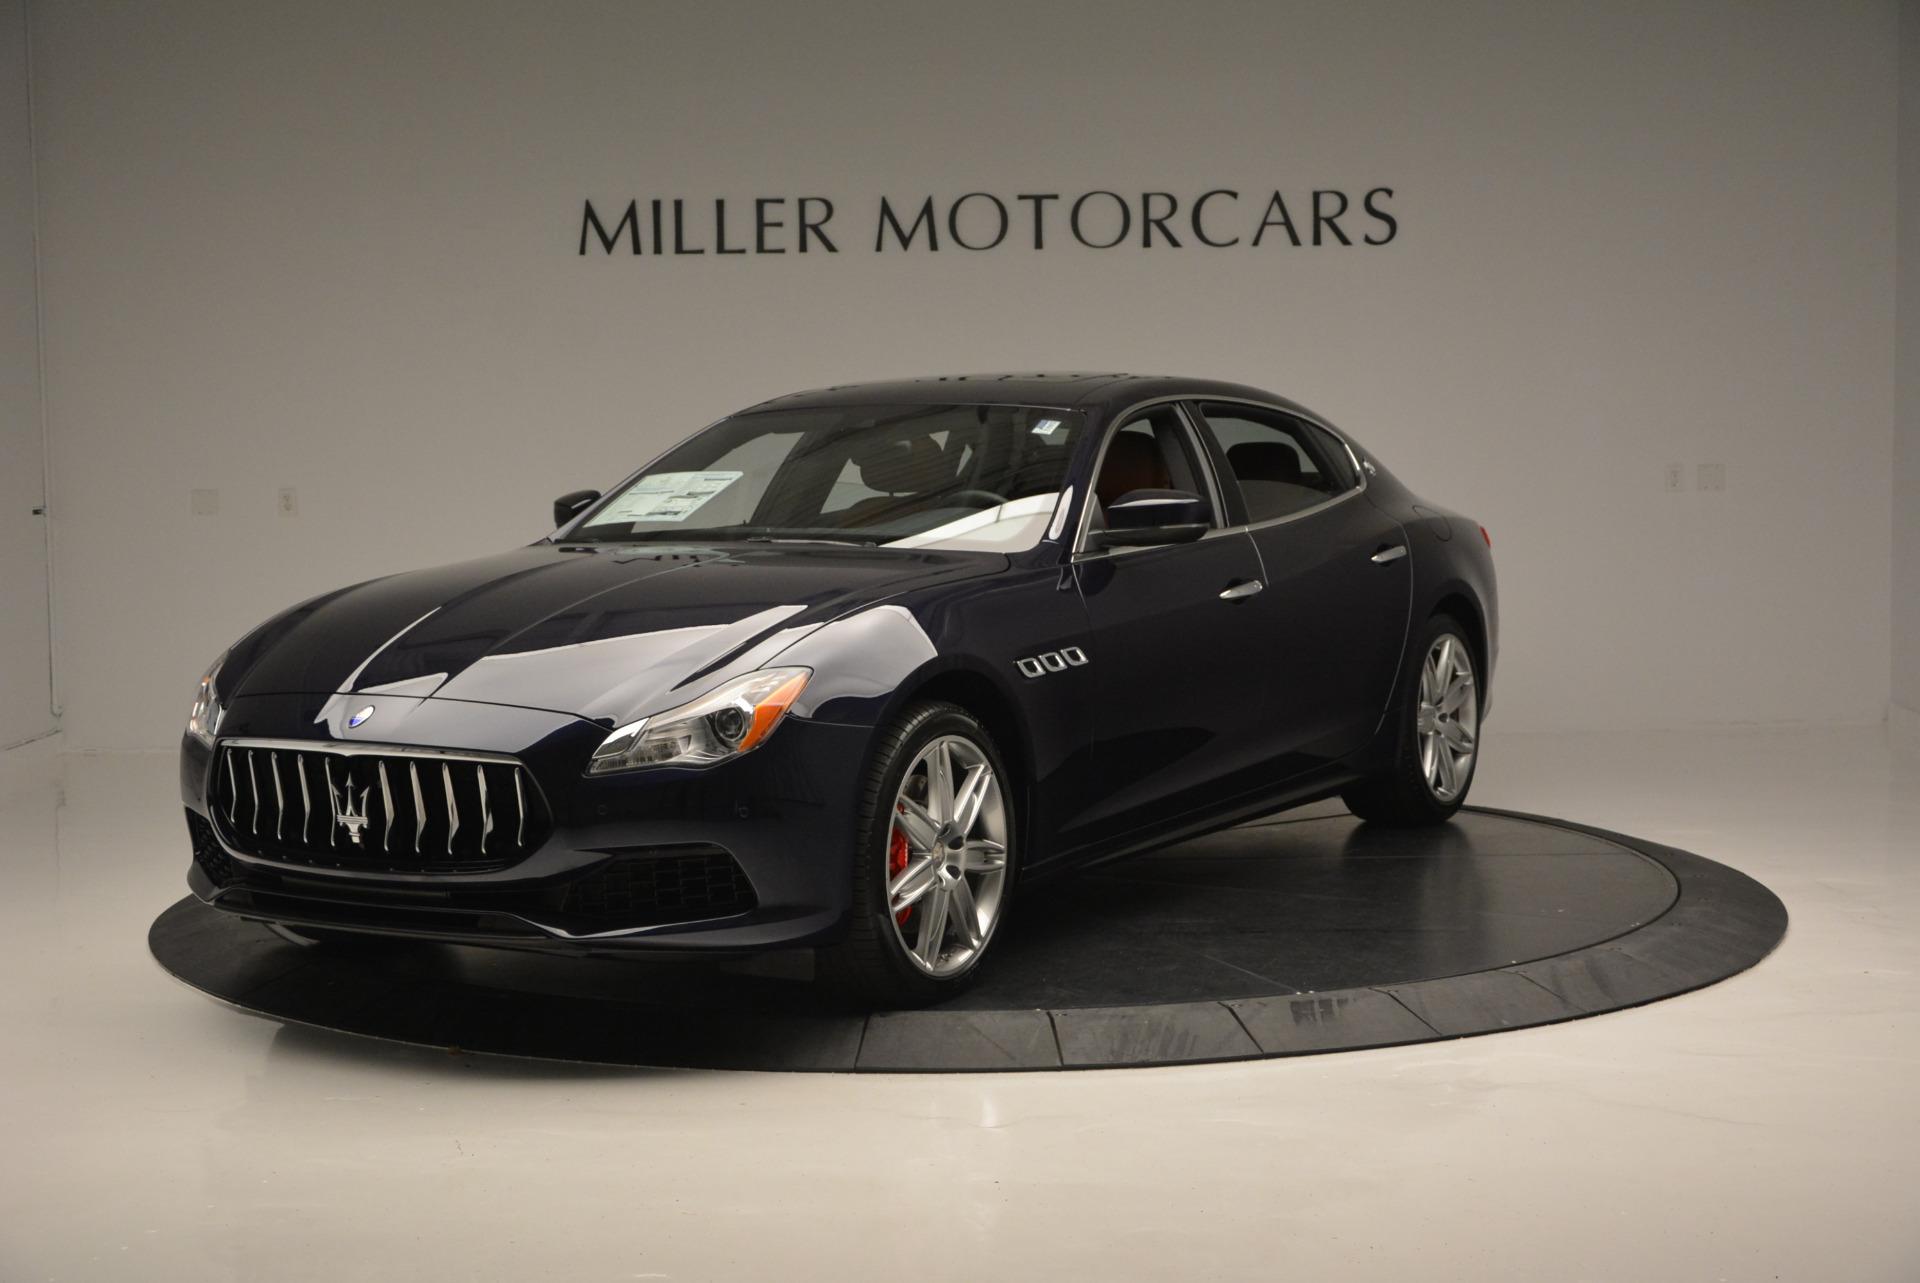 New 2017 Maserati Quattroporte S Q4 For Sale In Westport, CT 583_main